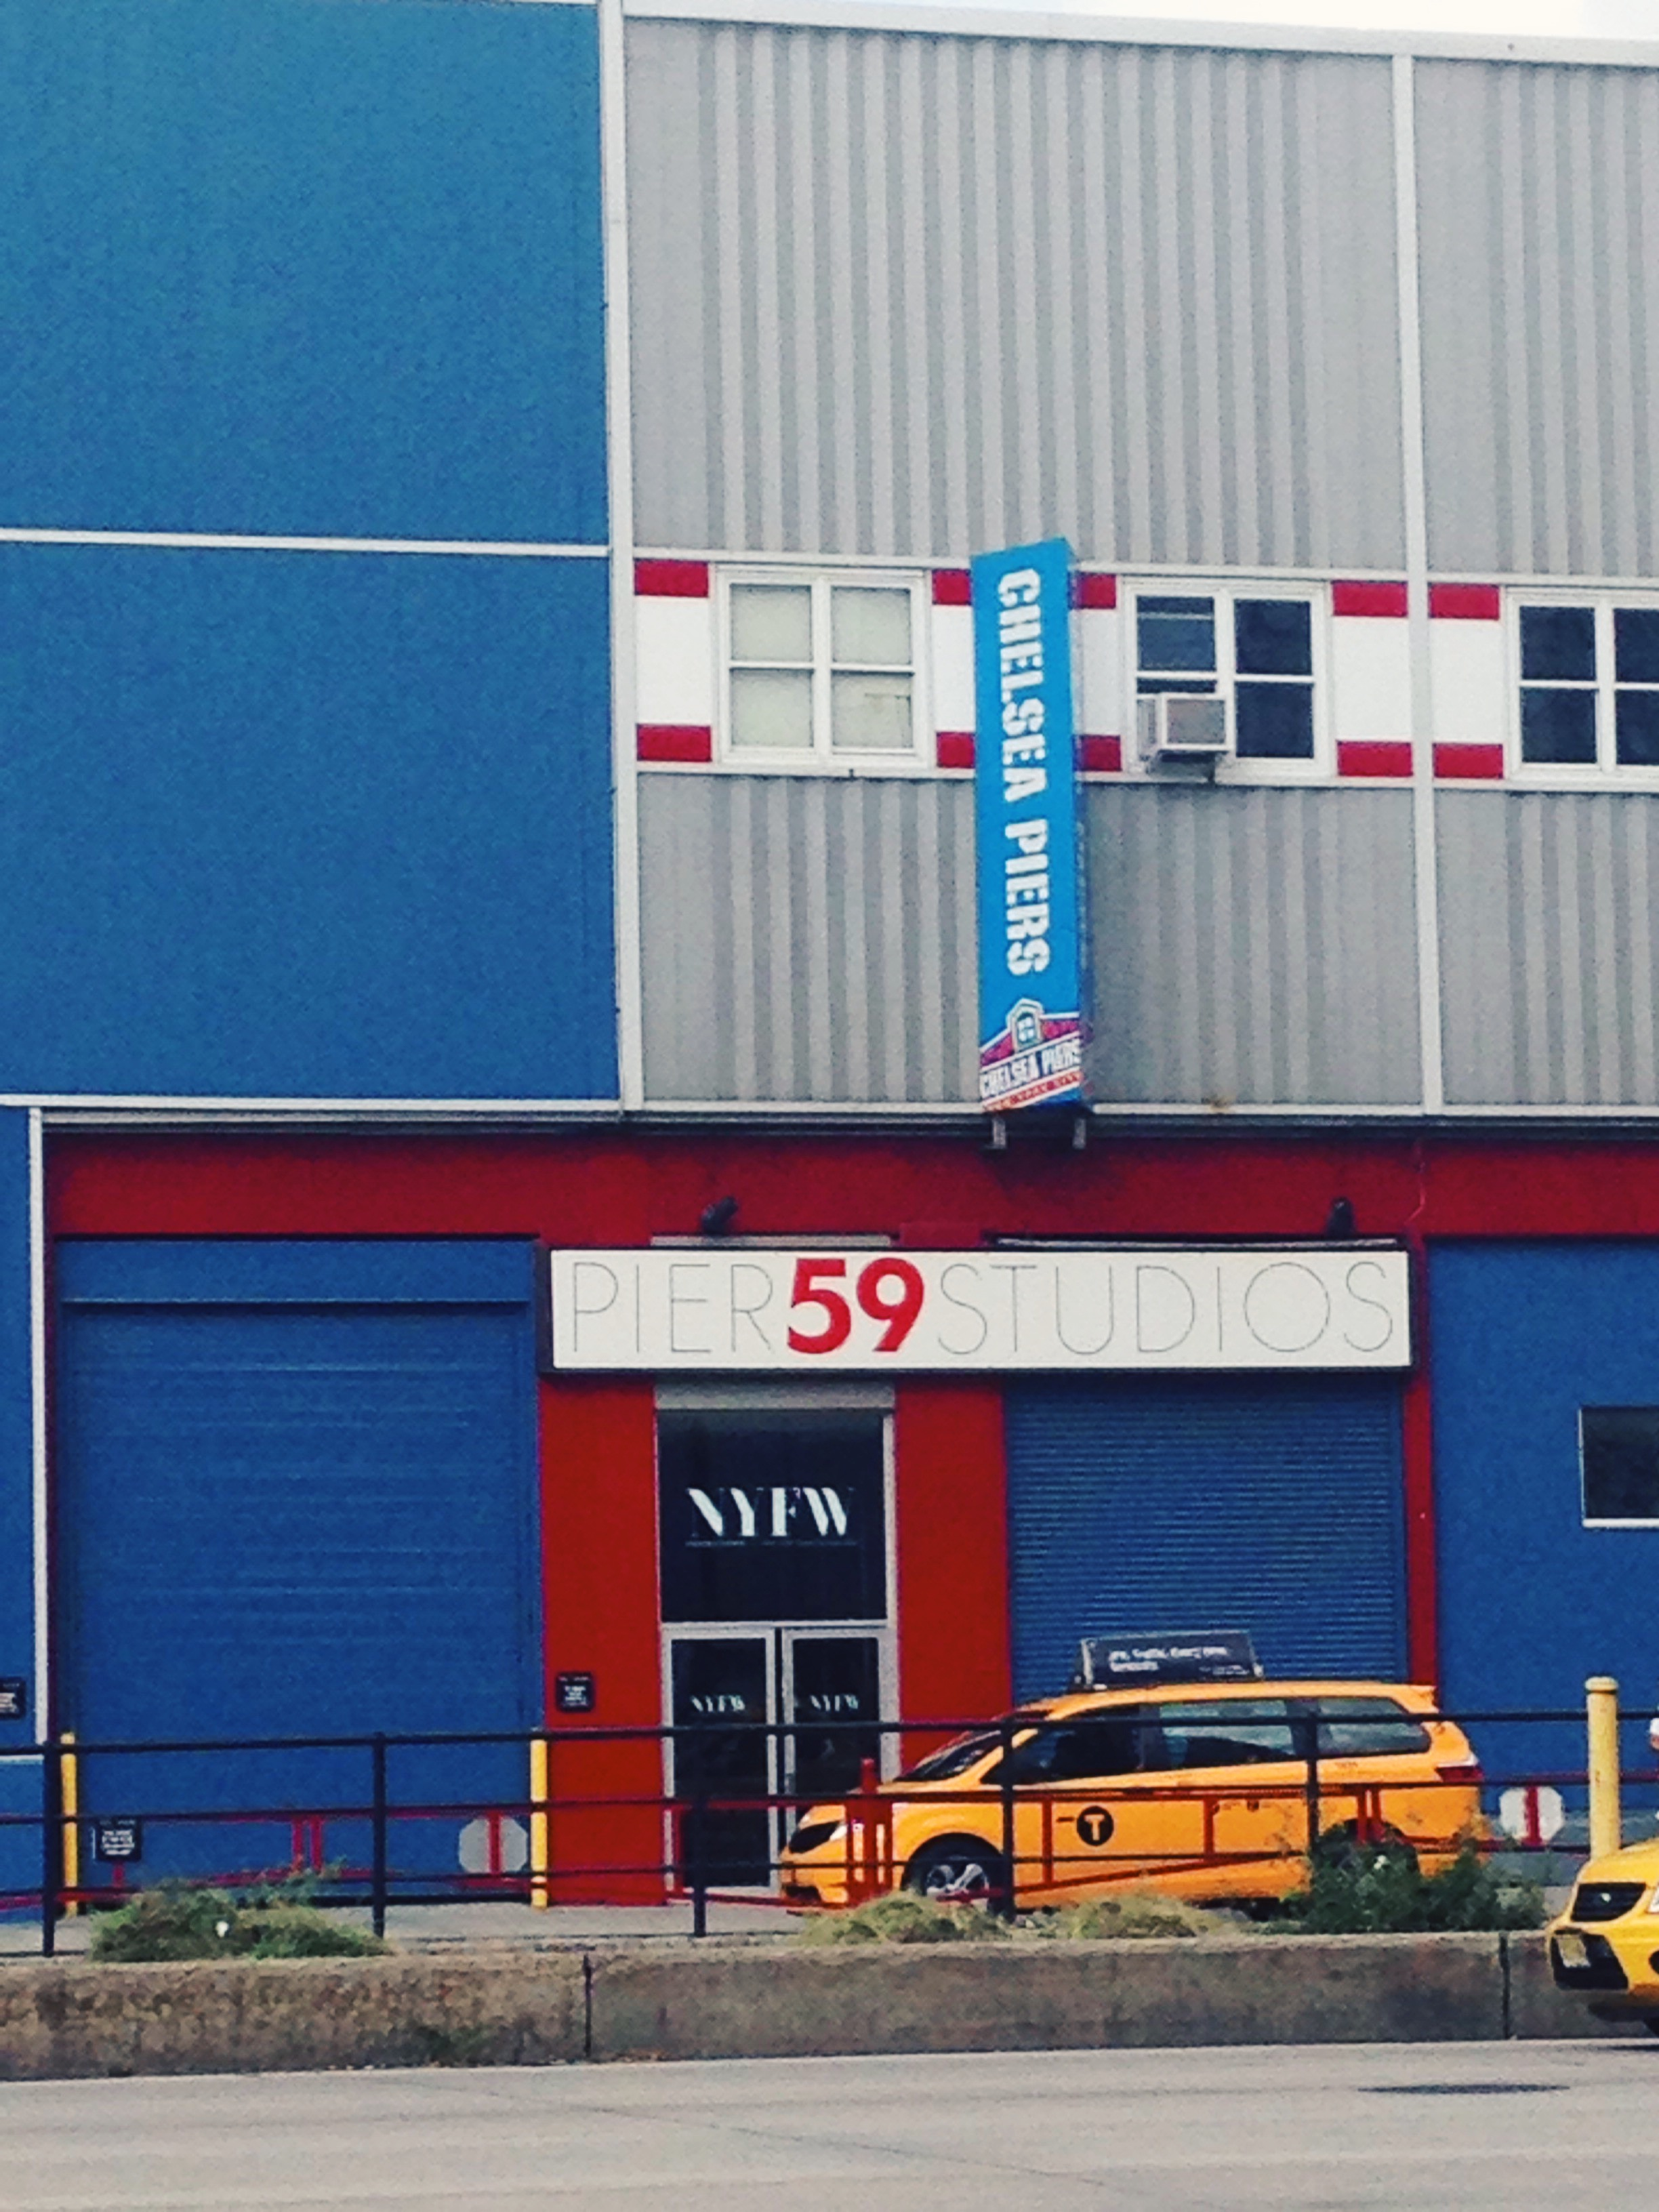 pier 59 studios